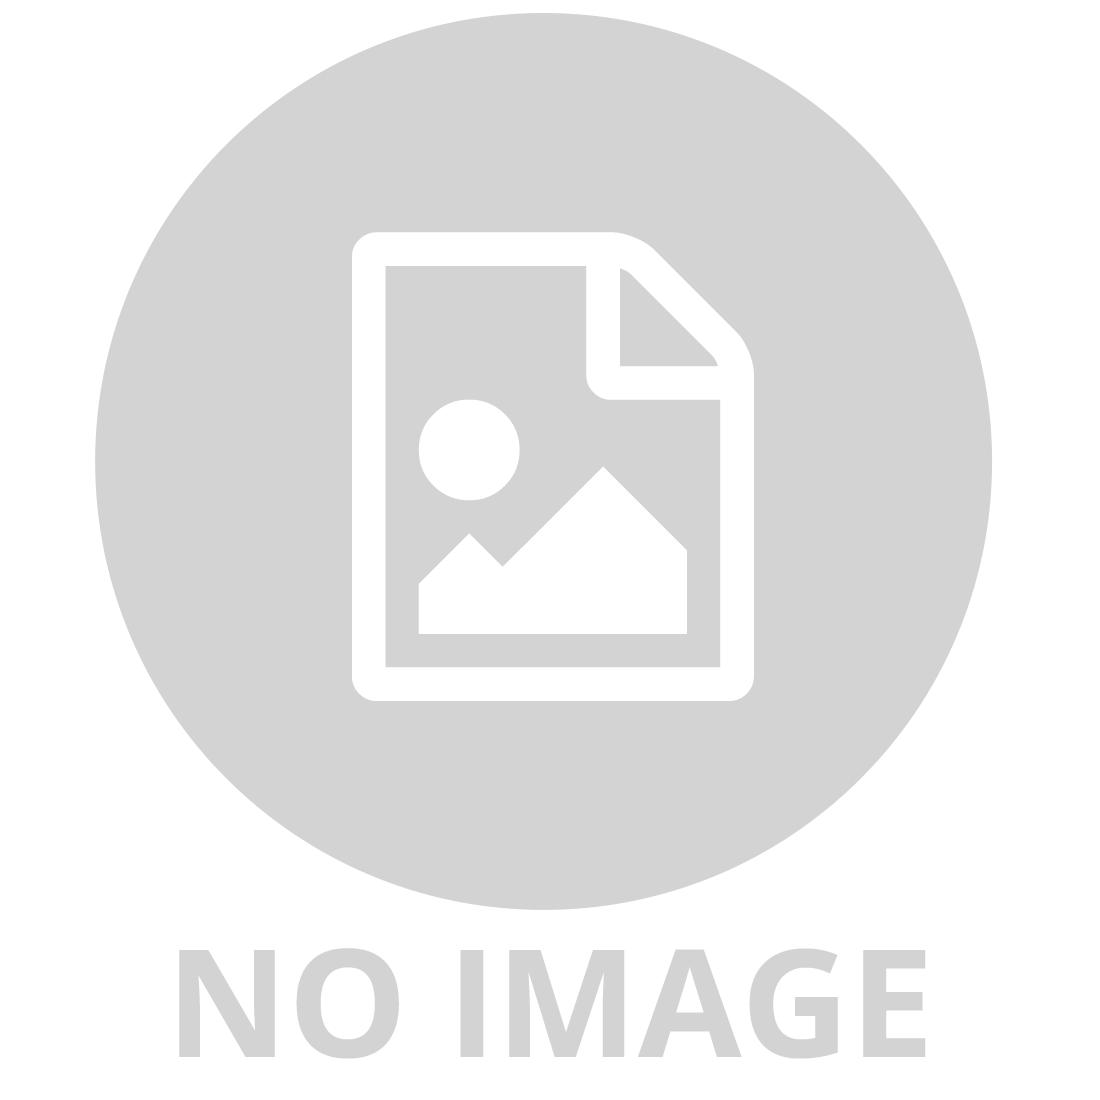 MAGTASTIX- 70 PIECE SET